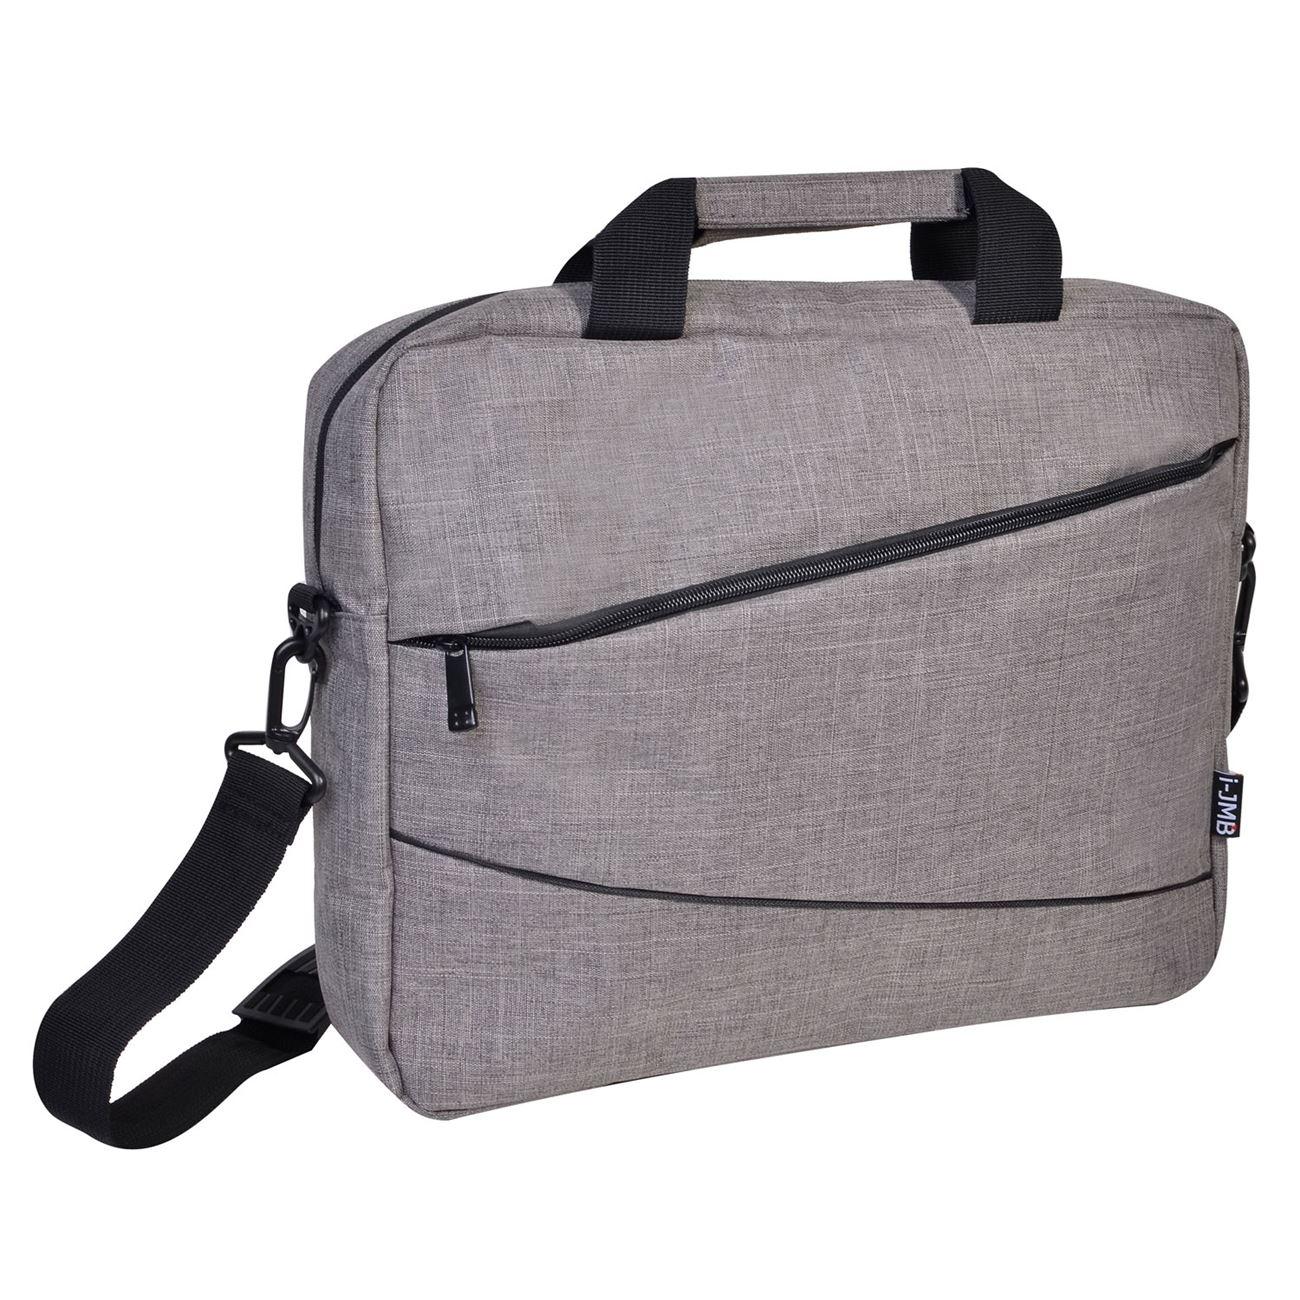 6da561c7c5 Τσάντα Λαπτοπ Γκρι I-JMB   Τσάντες Laptop Χεριού-Ώμου